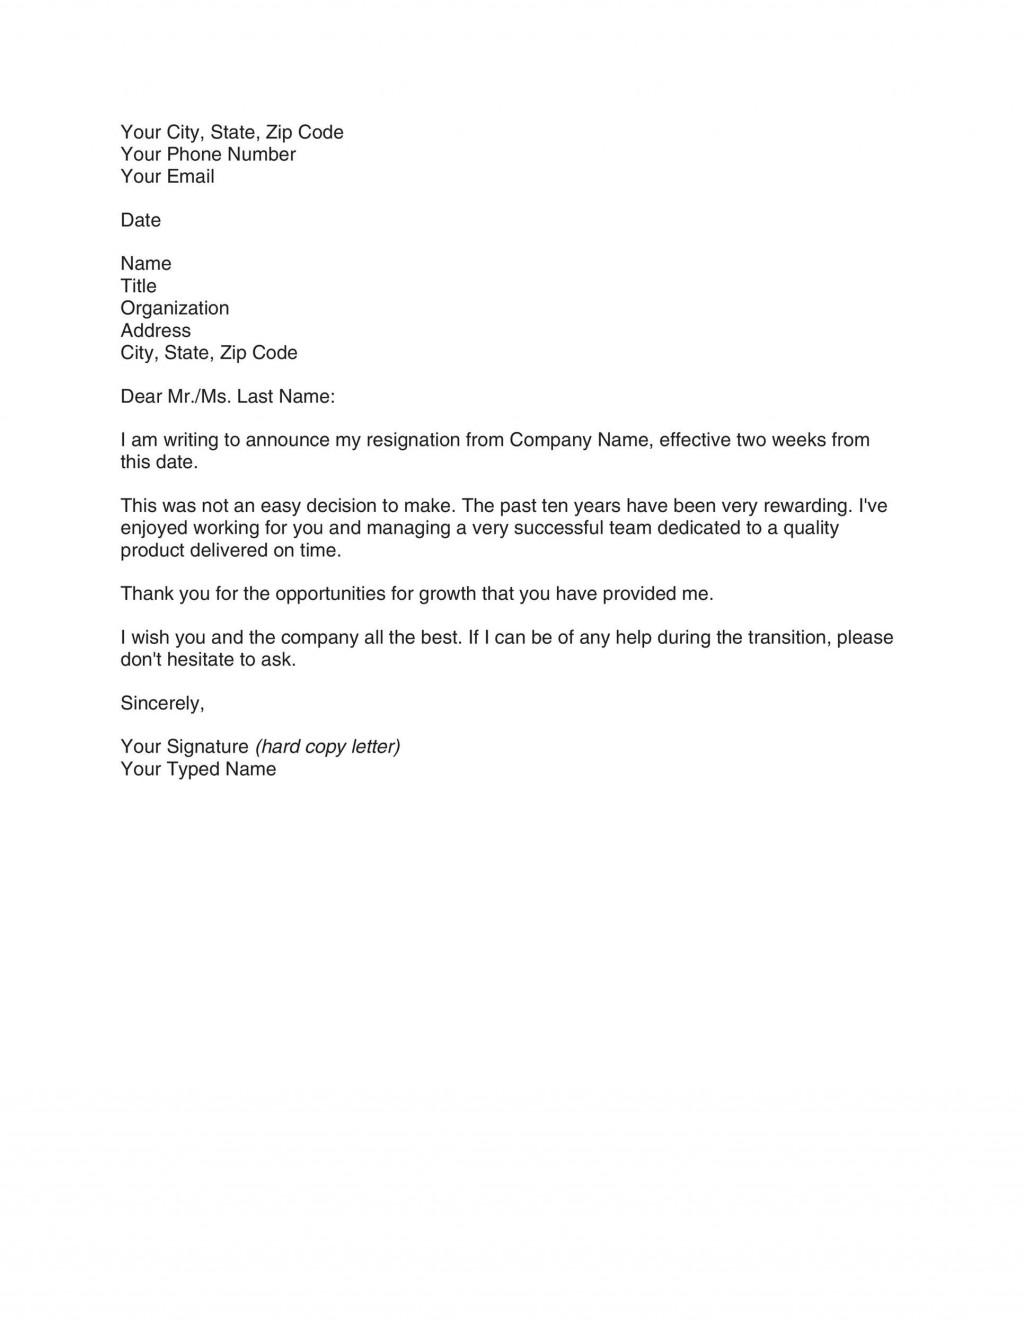 004 Singular Two Week Notice Letter Template Sample  Free Professional 2Large